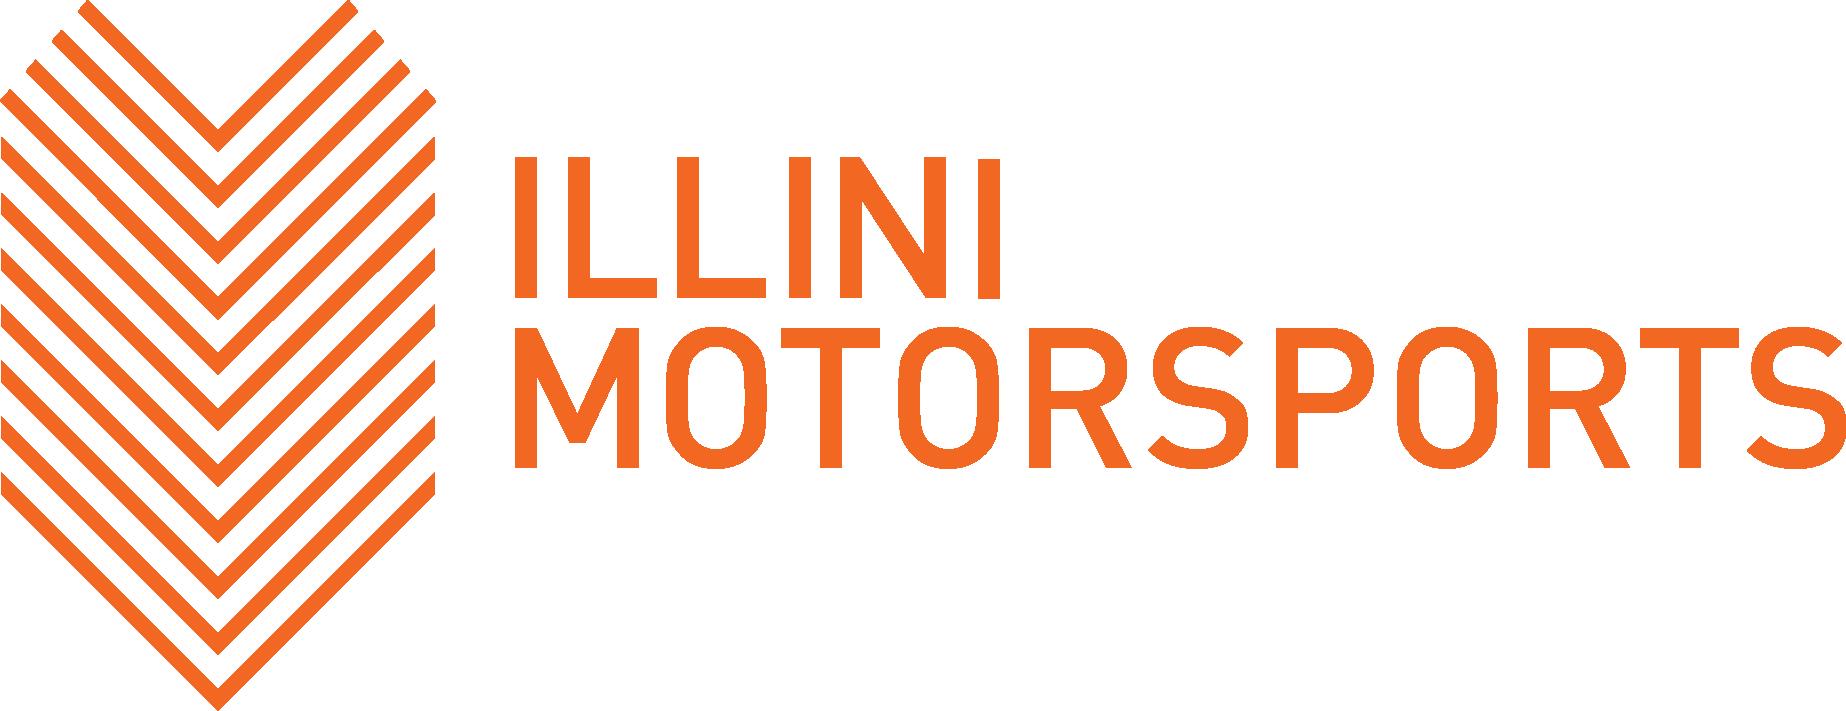 Illini Motorsports